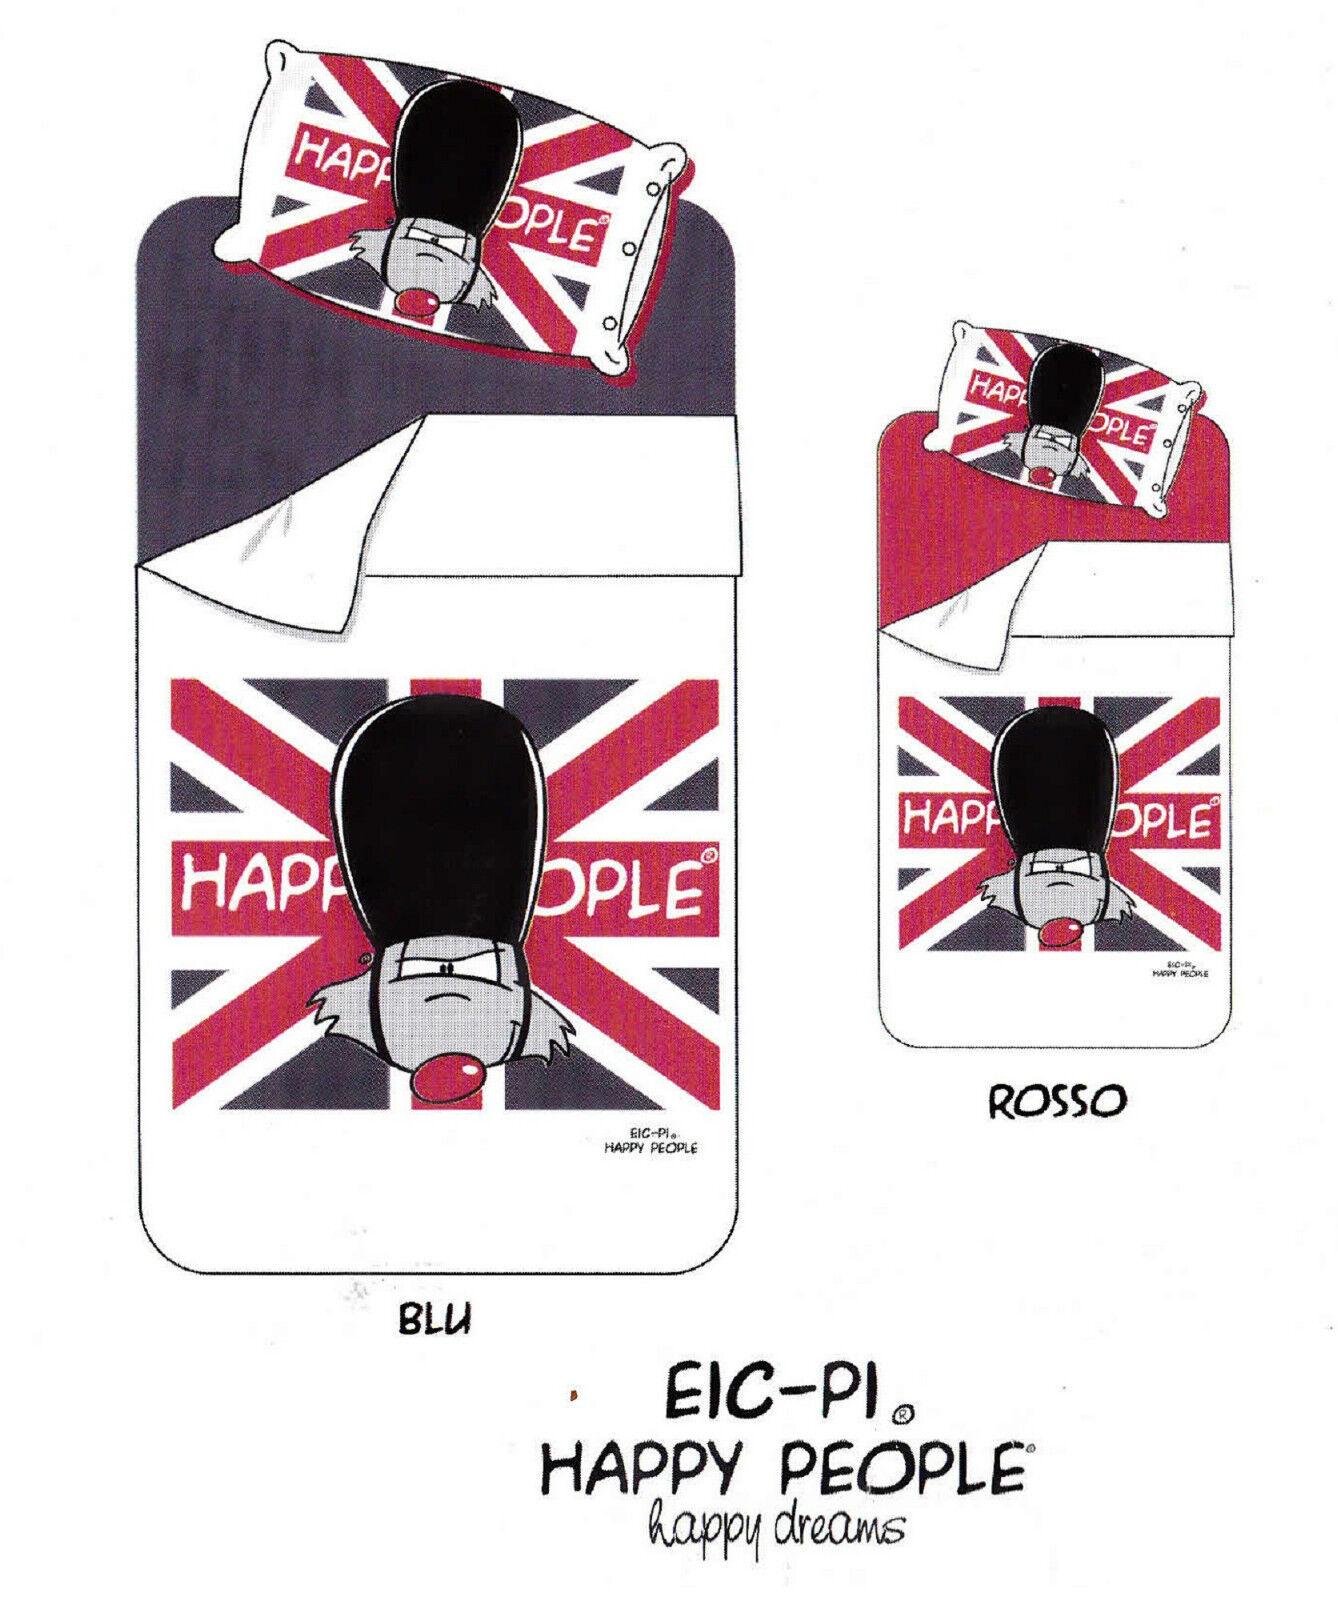 Completo Letto, Lenzuola Cotone Percalle. Singolo. EIC-PI HAPPY PEOPLE PEOPLE HAPPY LONDON. f6856e